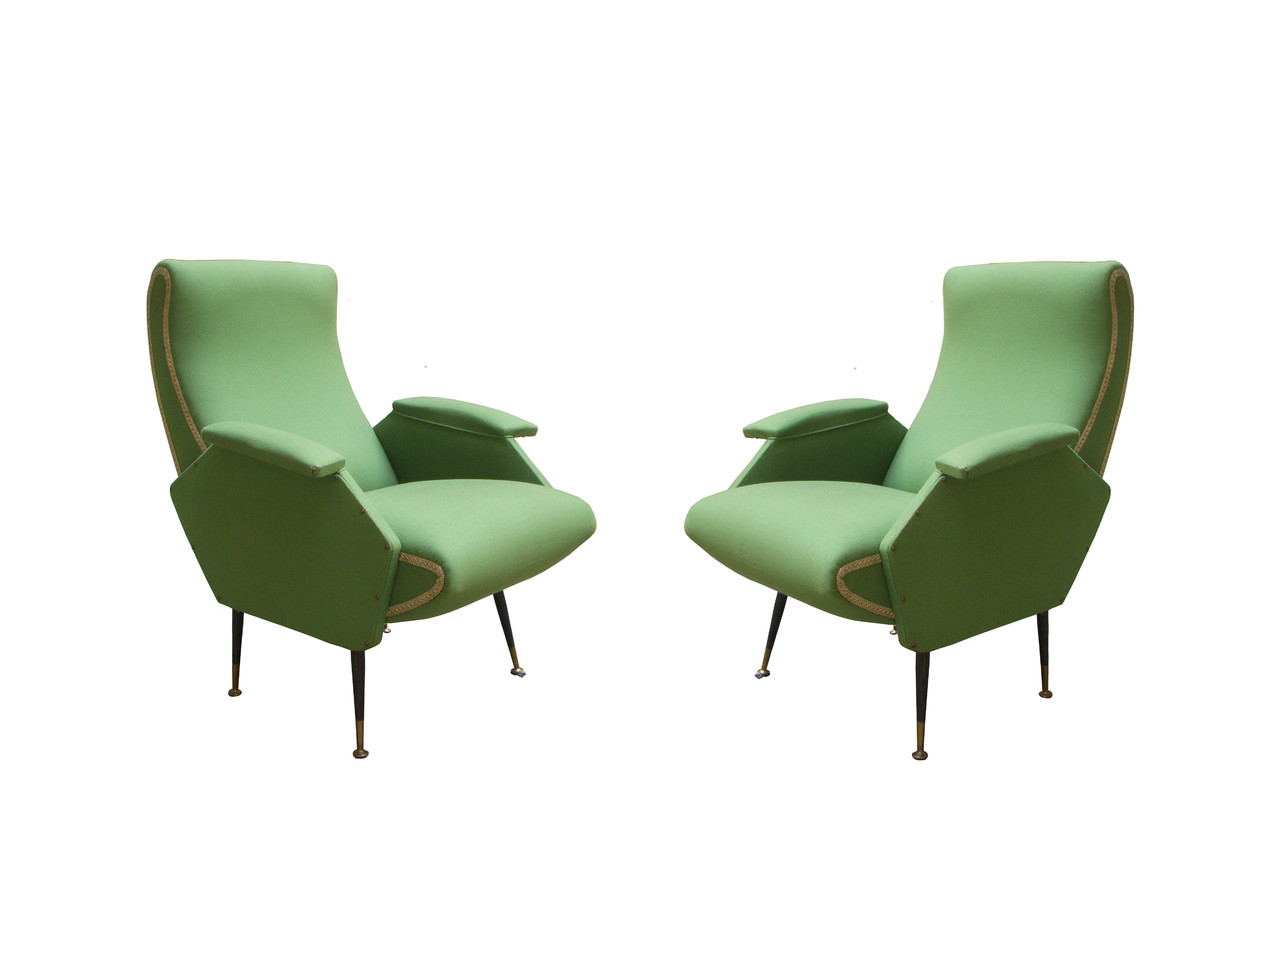 Anni 39 70 verde italian vintage sofa - Mobili vintage anni 60 ...